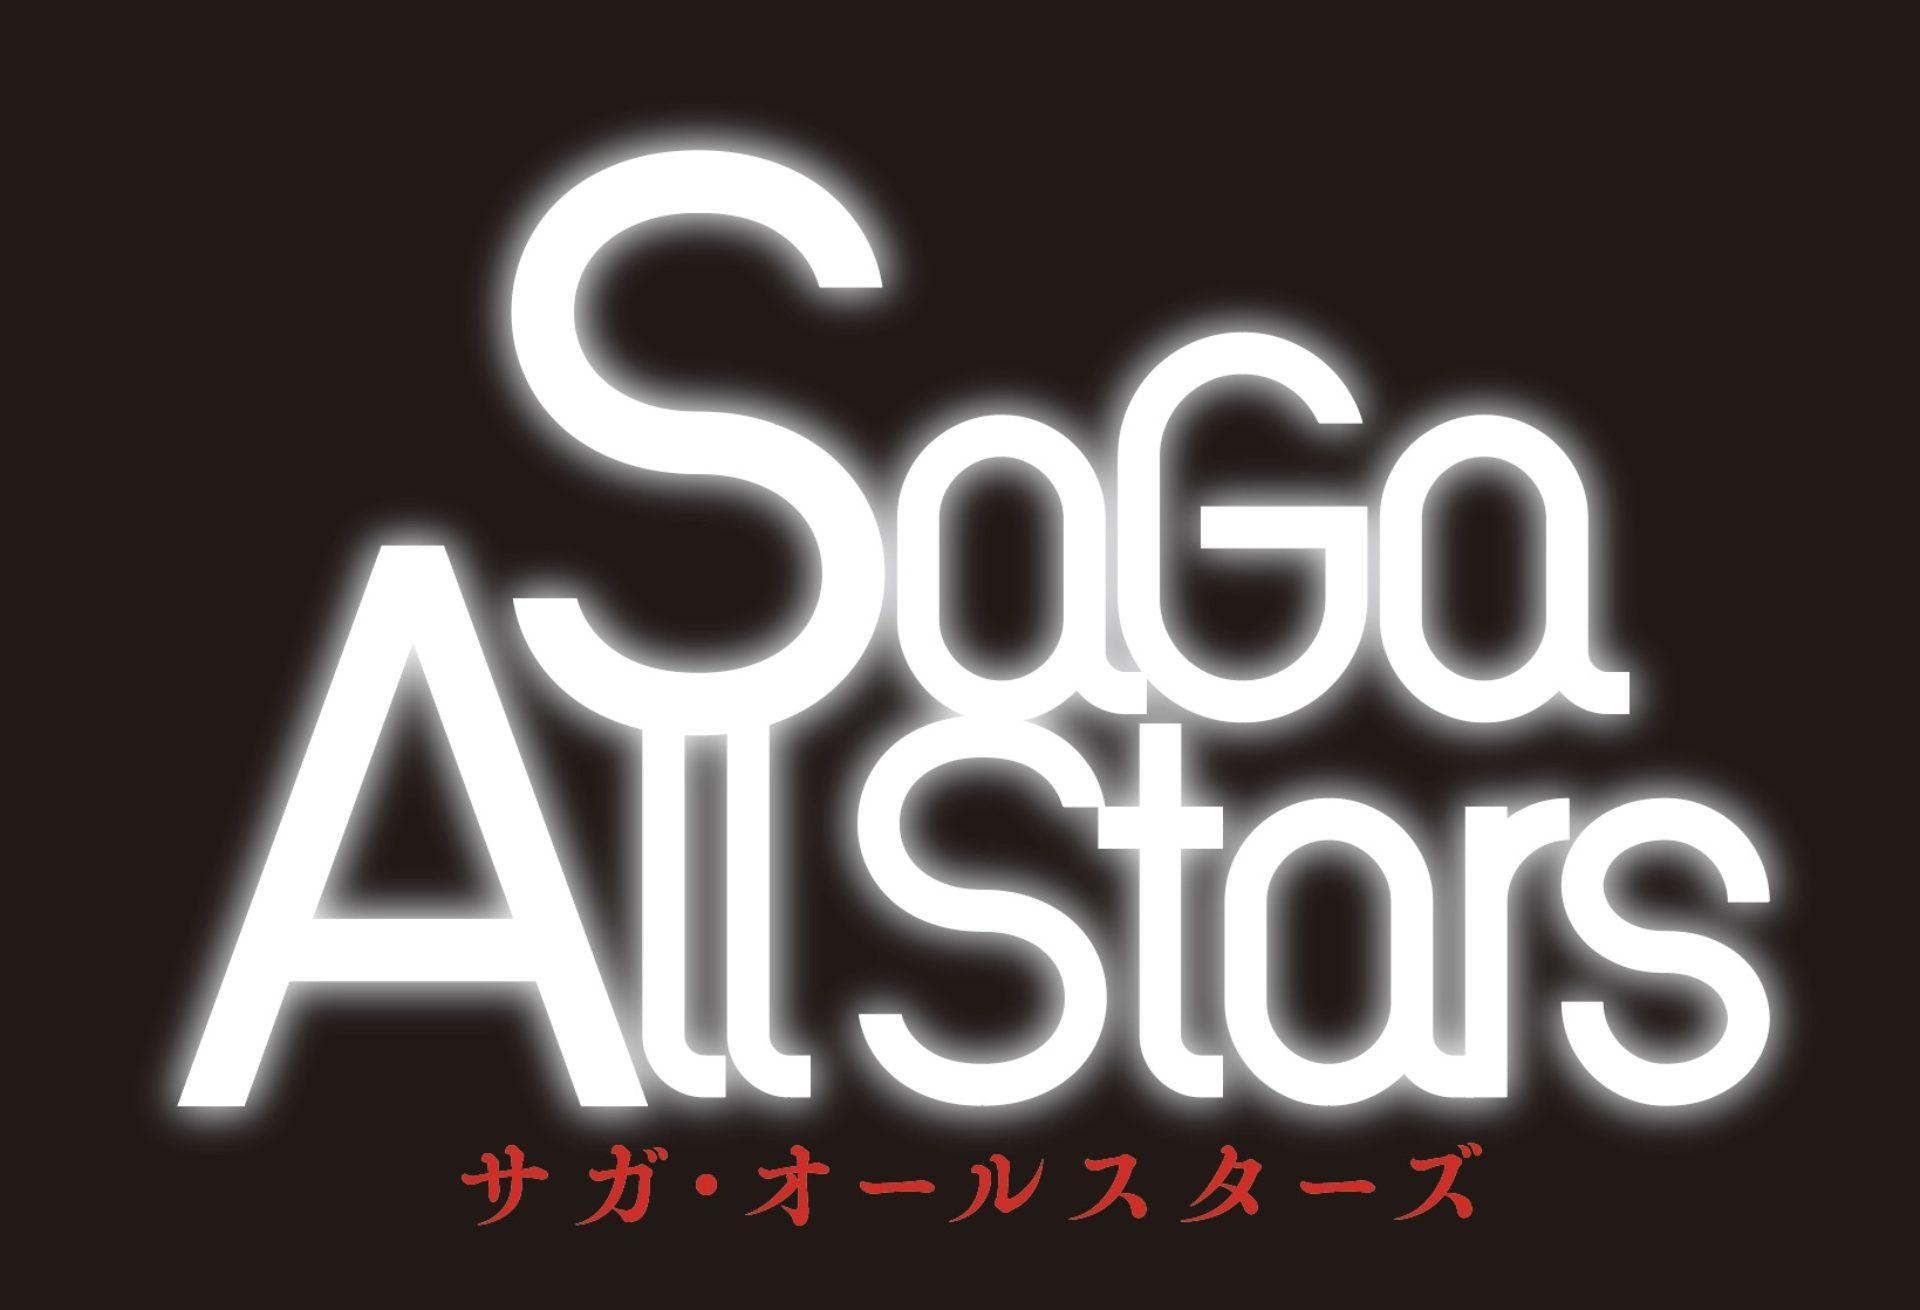 【SaGa Allstars:サガ・オールスターズ】